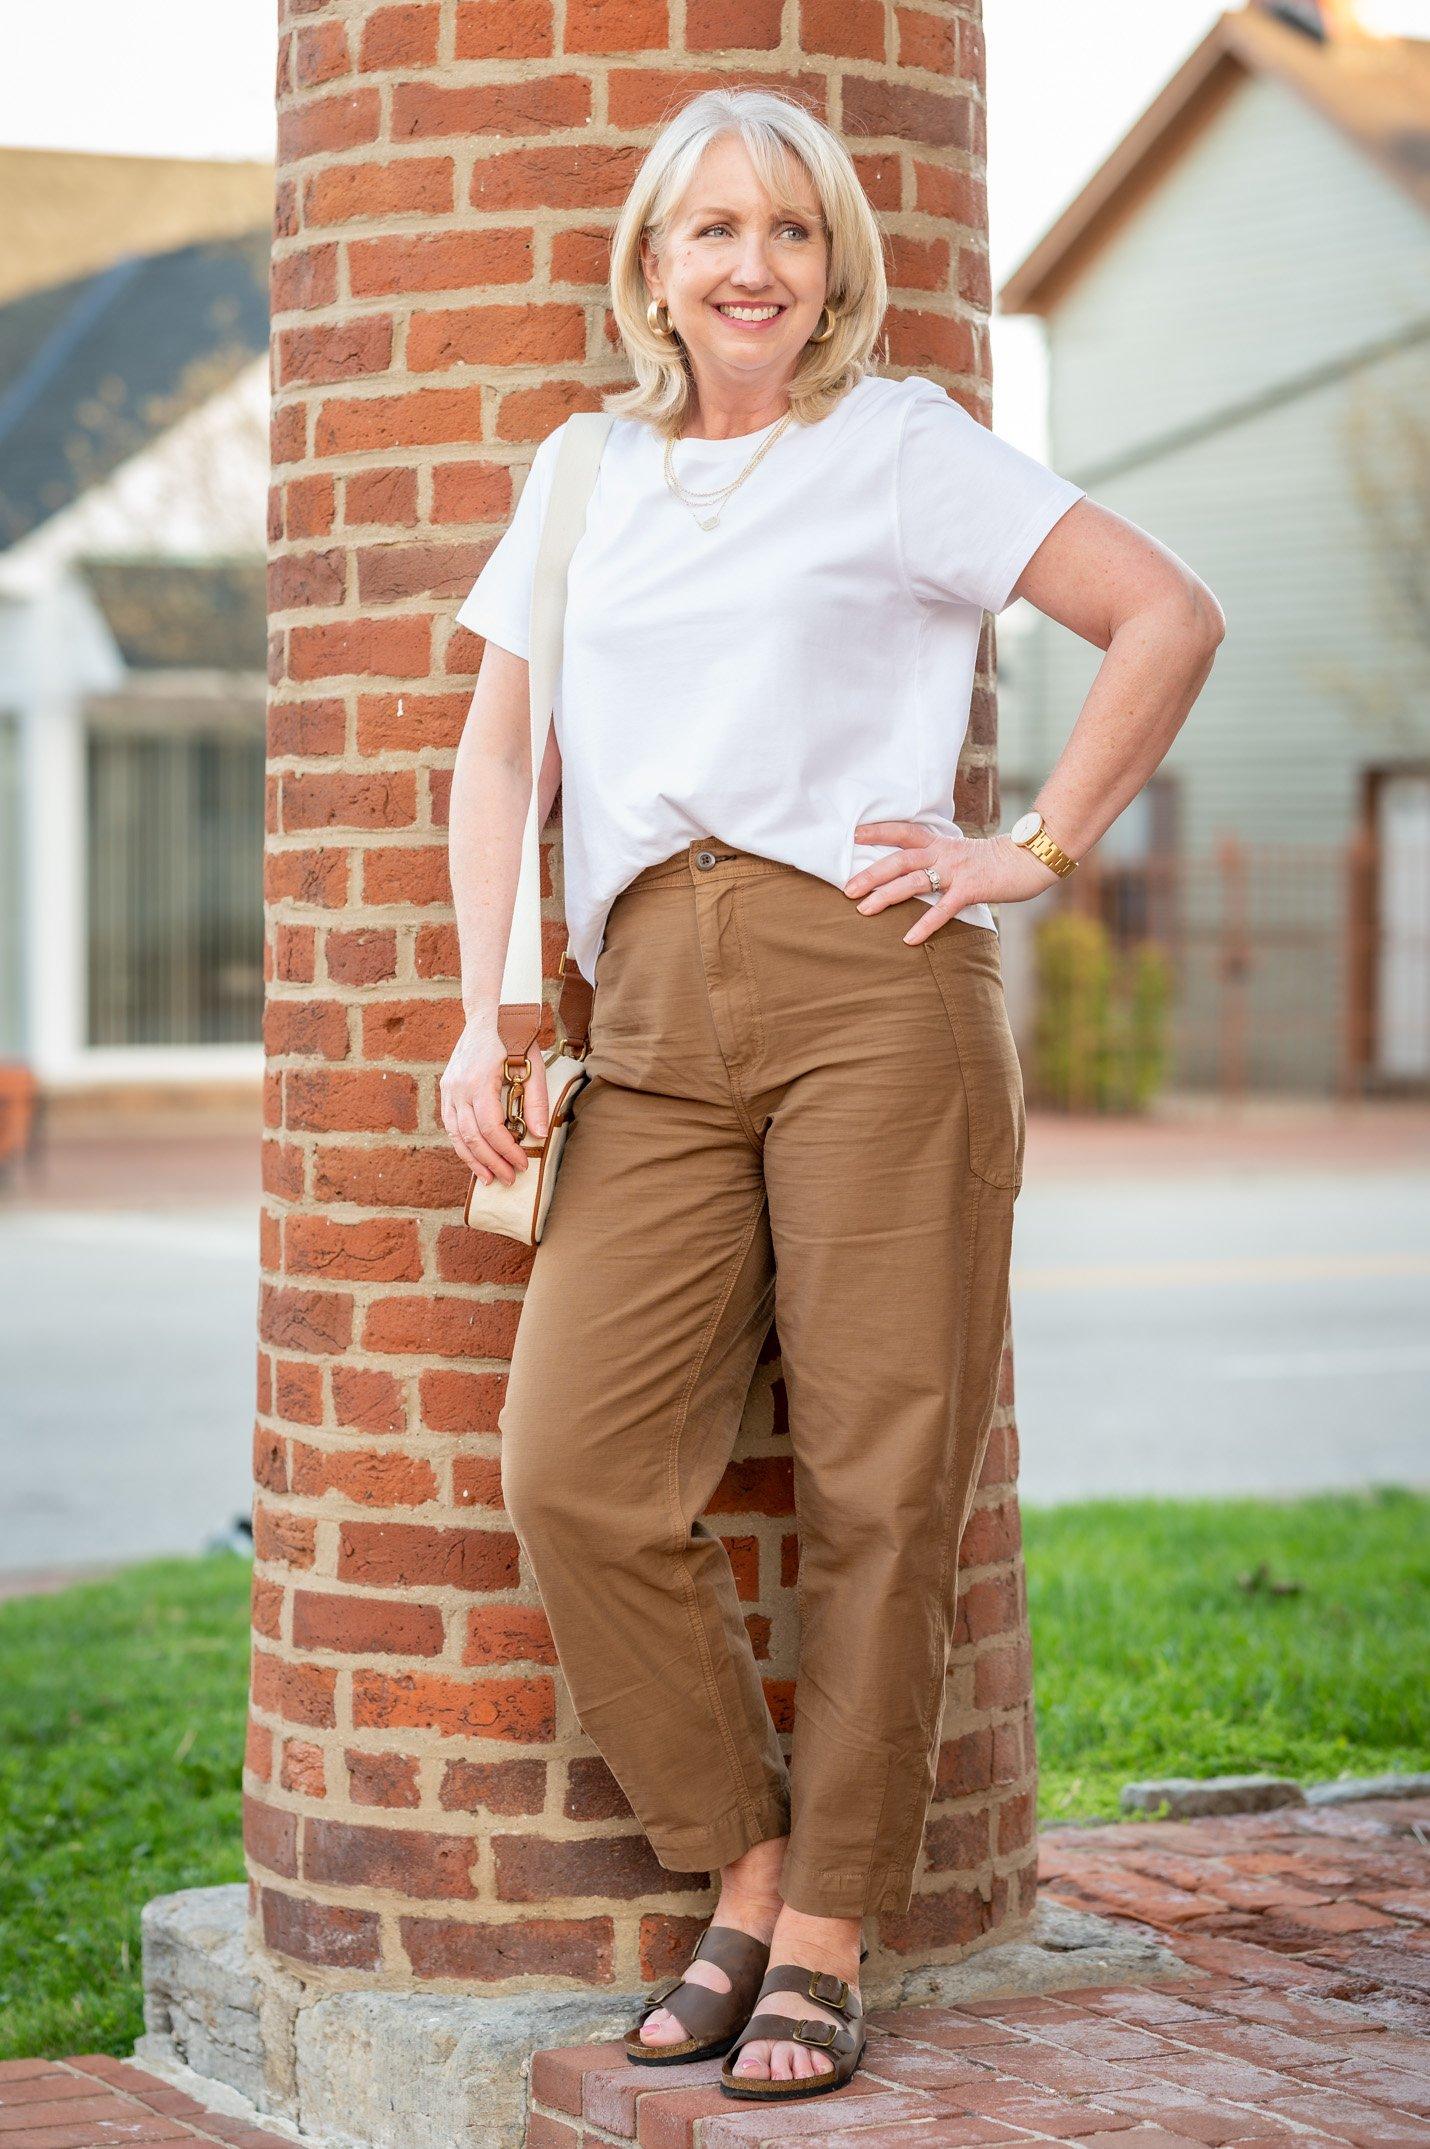 Barrel Pants with Sandals